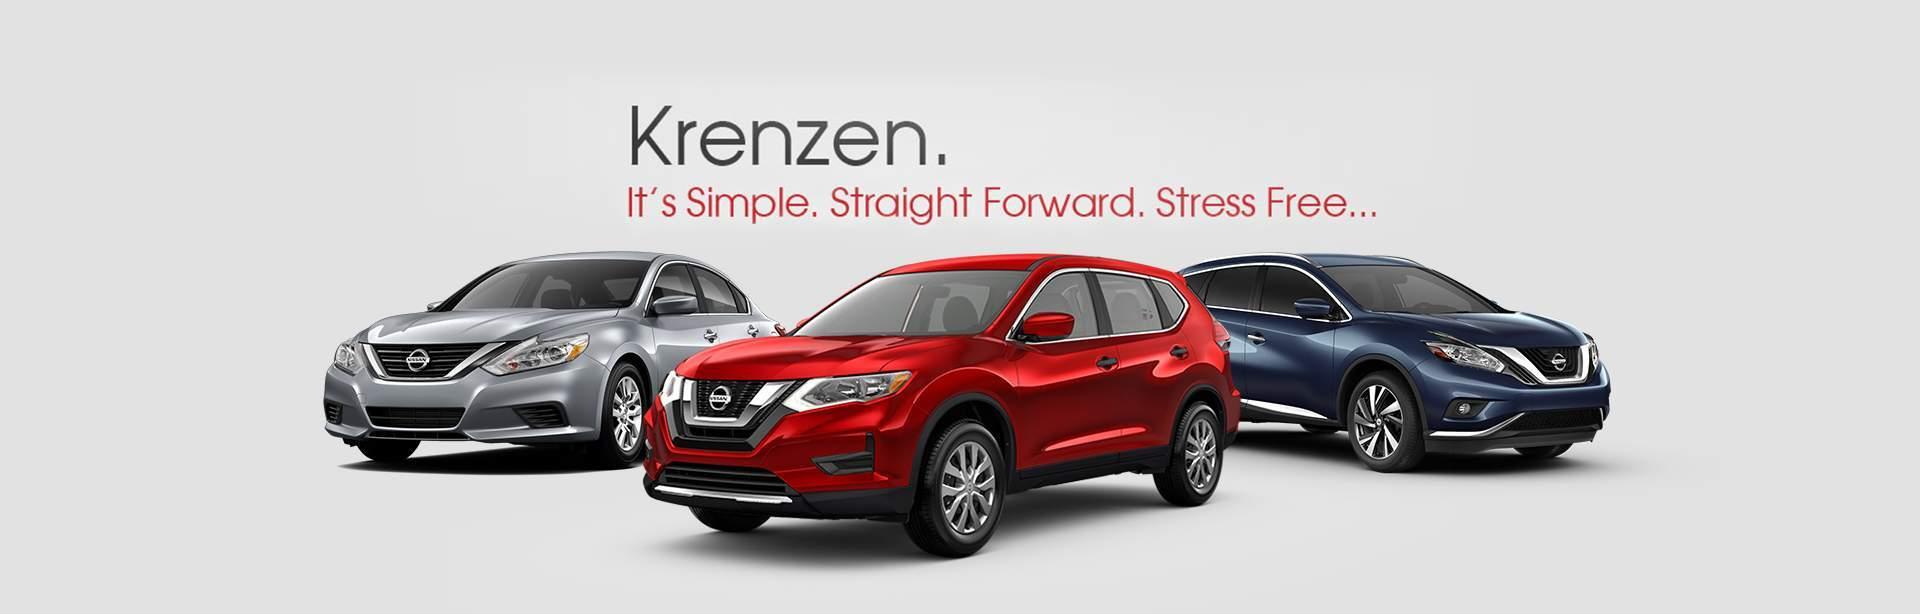 Nissan Dealers Mn >> Honda Lincoln Nissan Dealership Duluth Mn Used Cars Krenzen